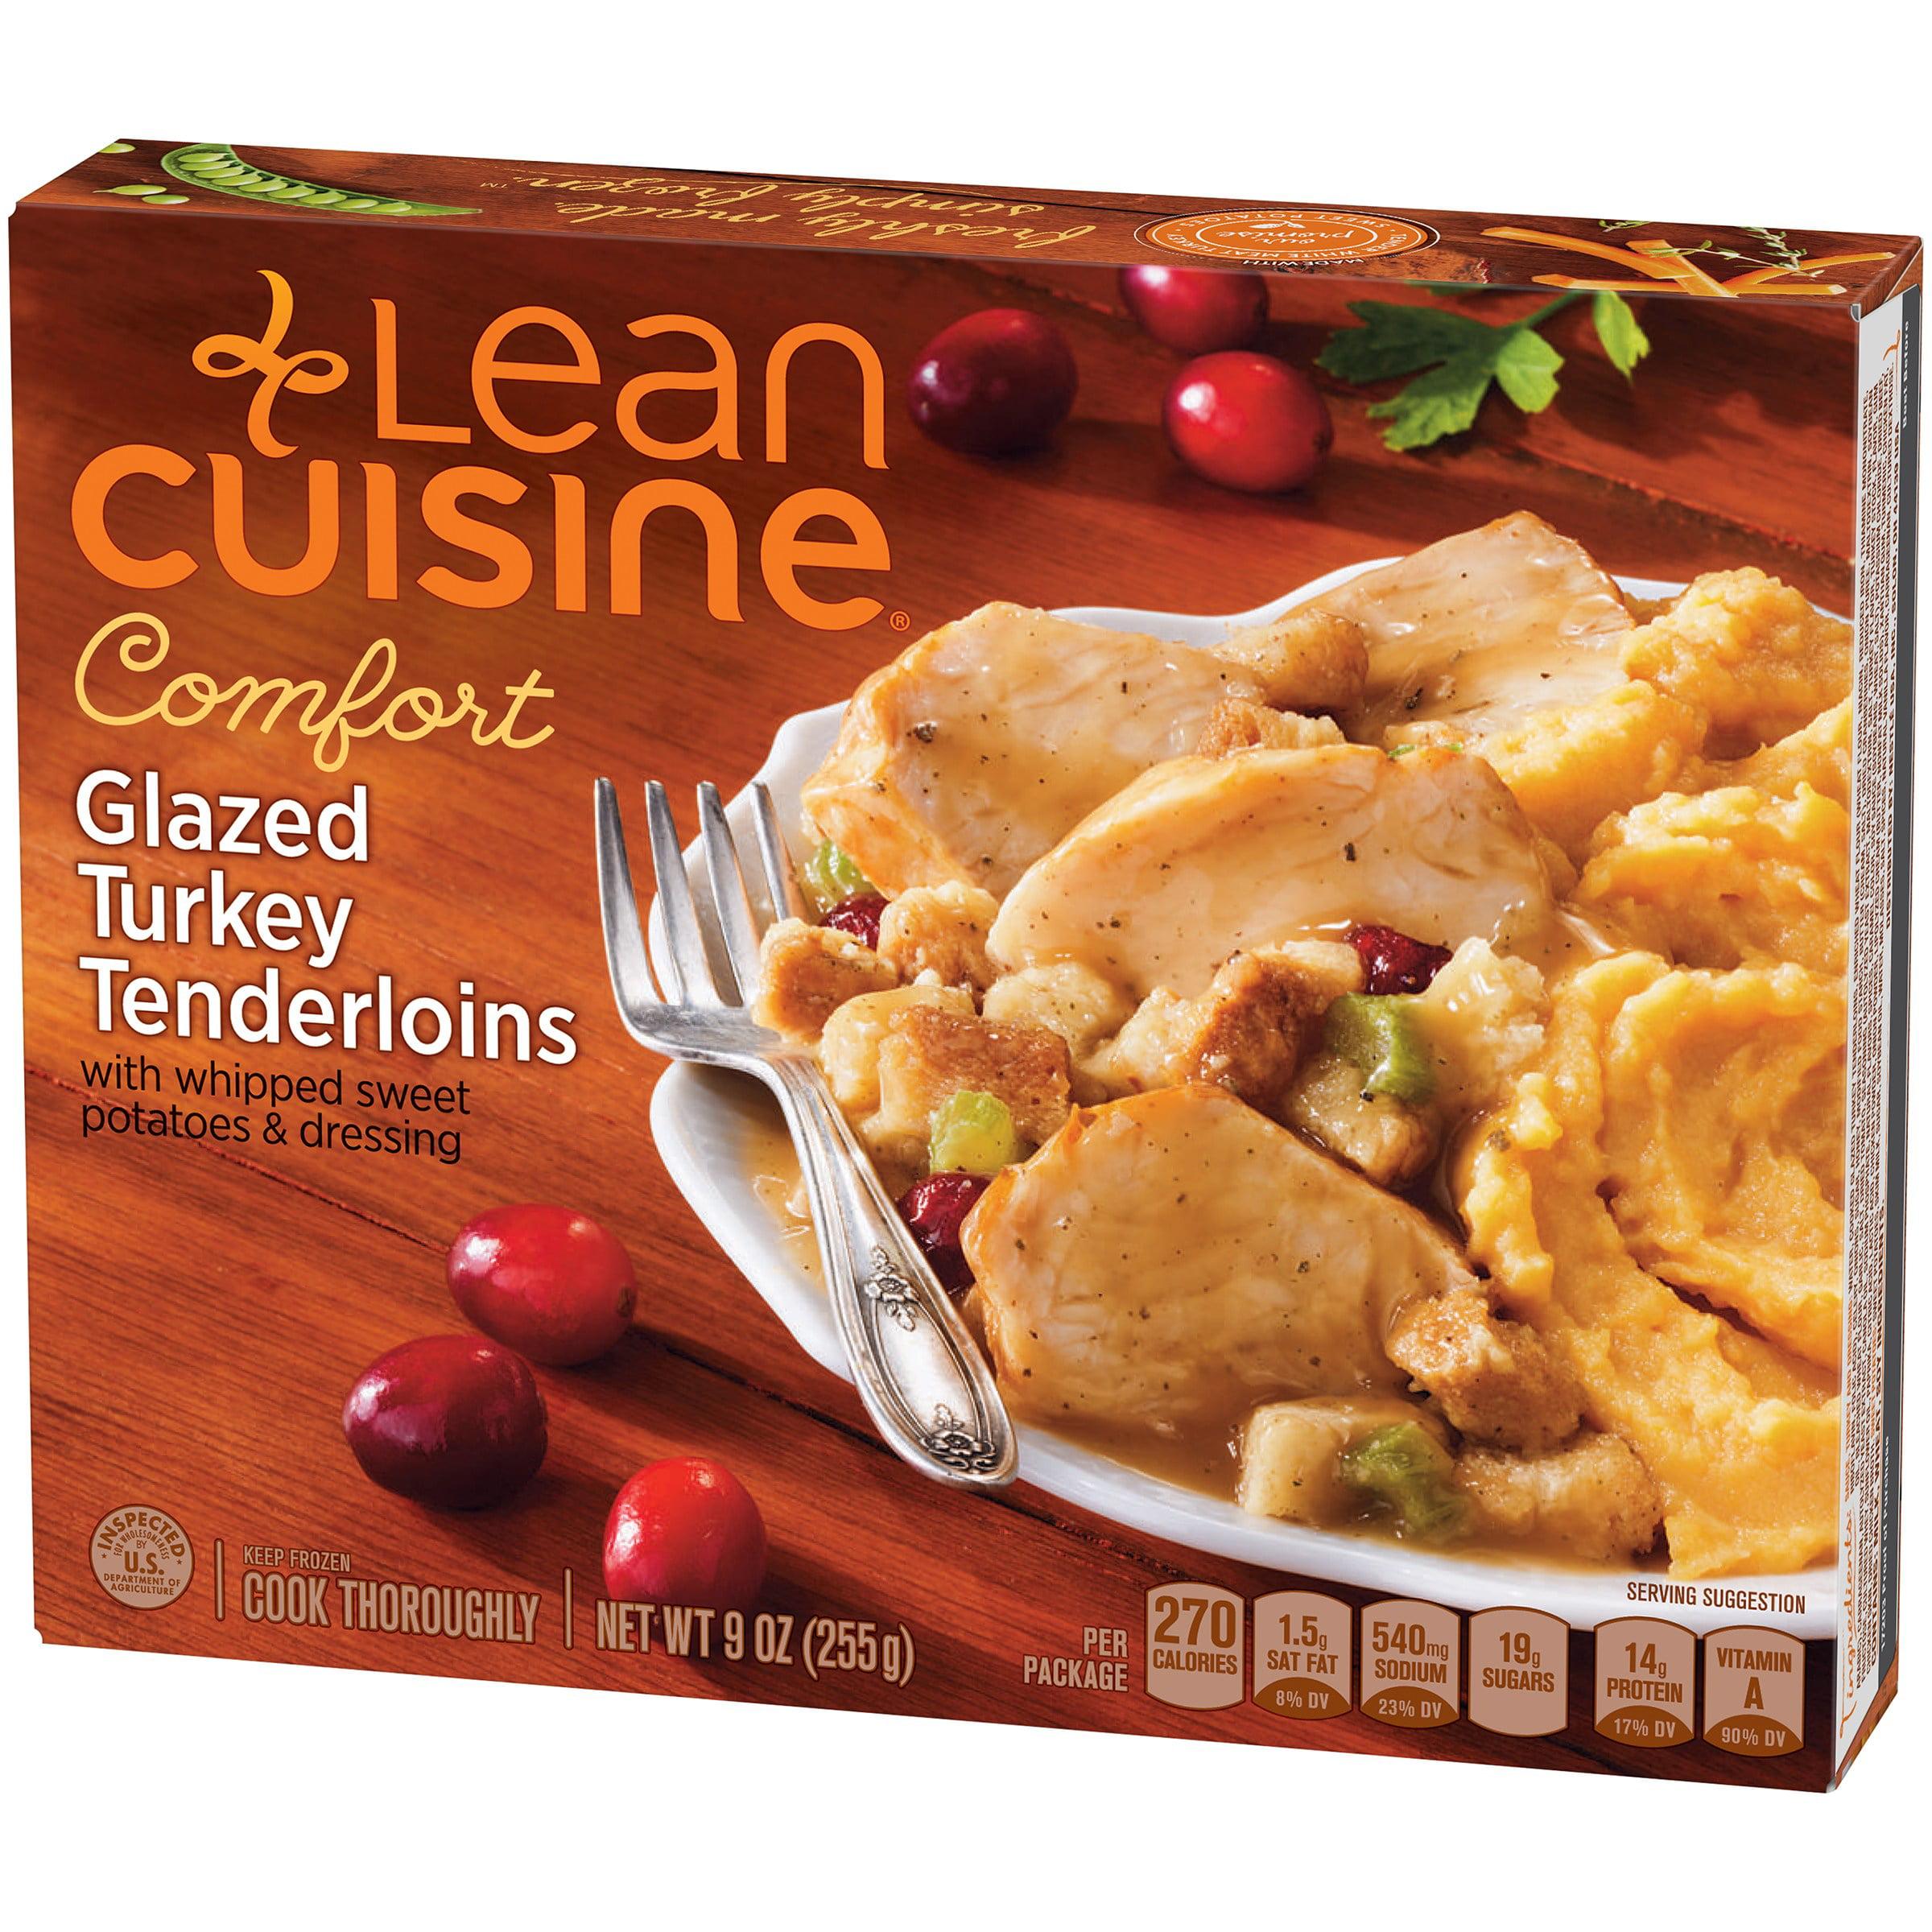 Lean Cuisine Frozen Dinners U0026 Meals   Walmart.com